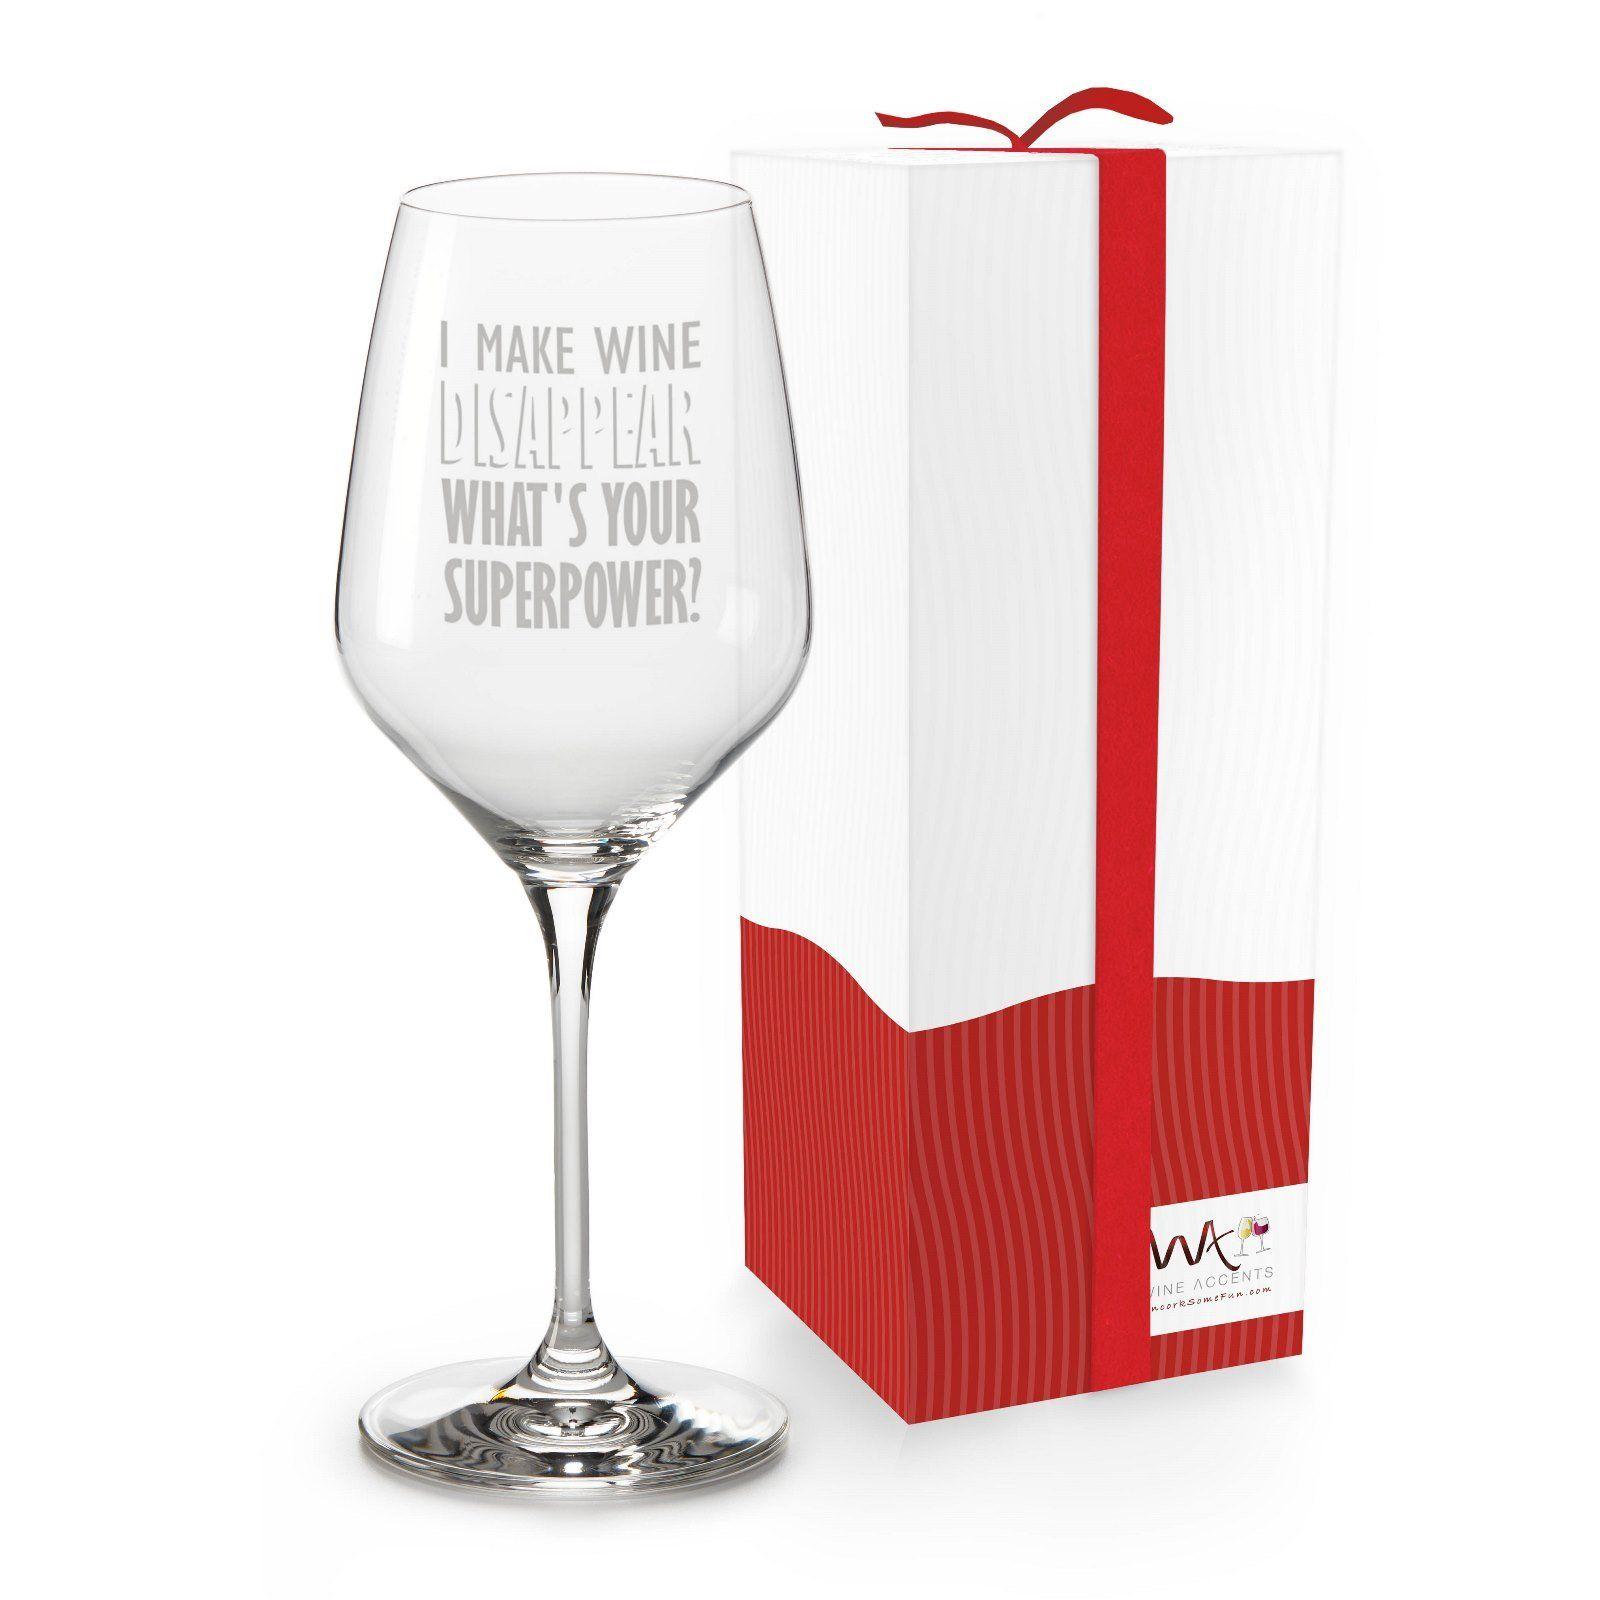 Wine Glass In Gift Box 18 5 Oz Designer Wine Glass With Funny Saying I Make Wi Unique Valentines Day Gifts Valentines Day Gifts For Her Funny Wine Glasses